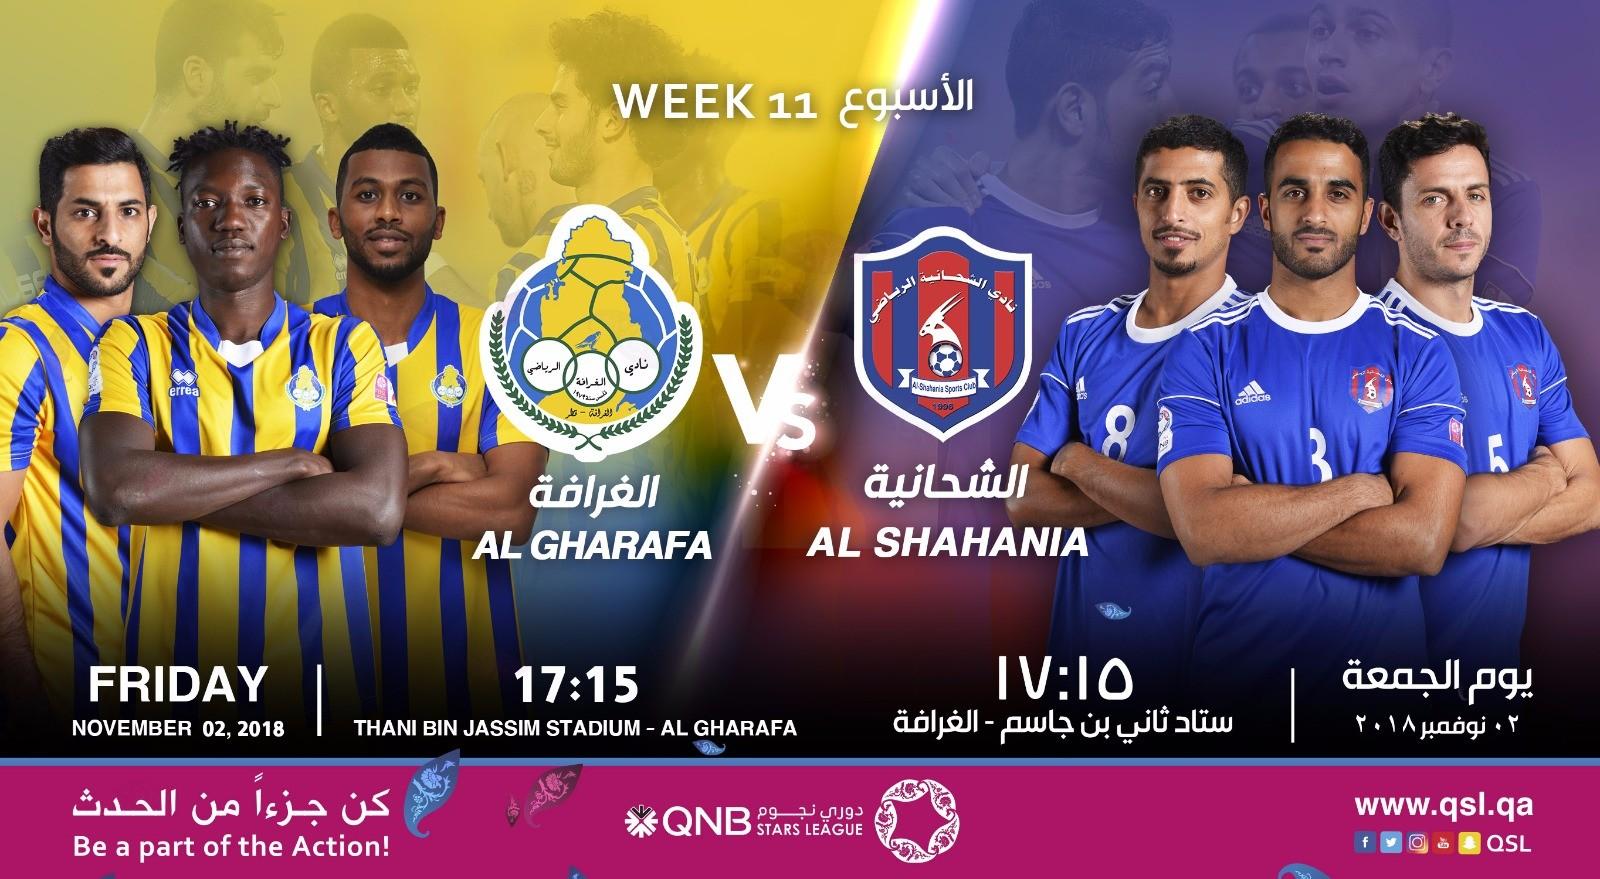 QNB Stars League Week 11 — Al Gharafa vs Al Shahania